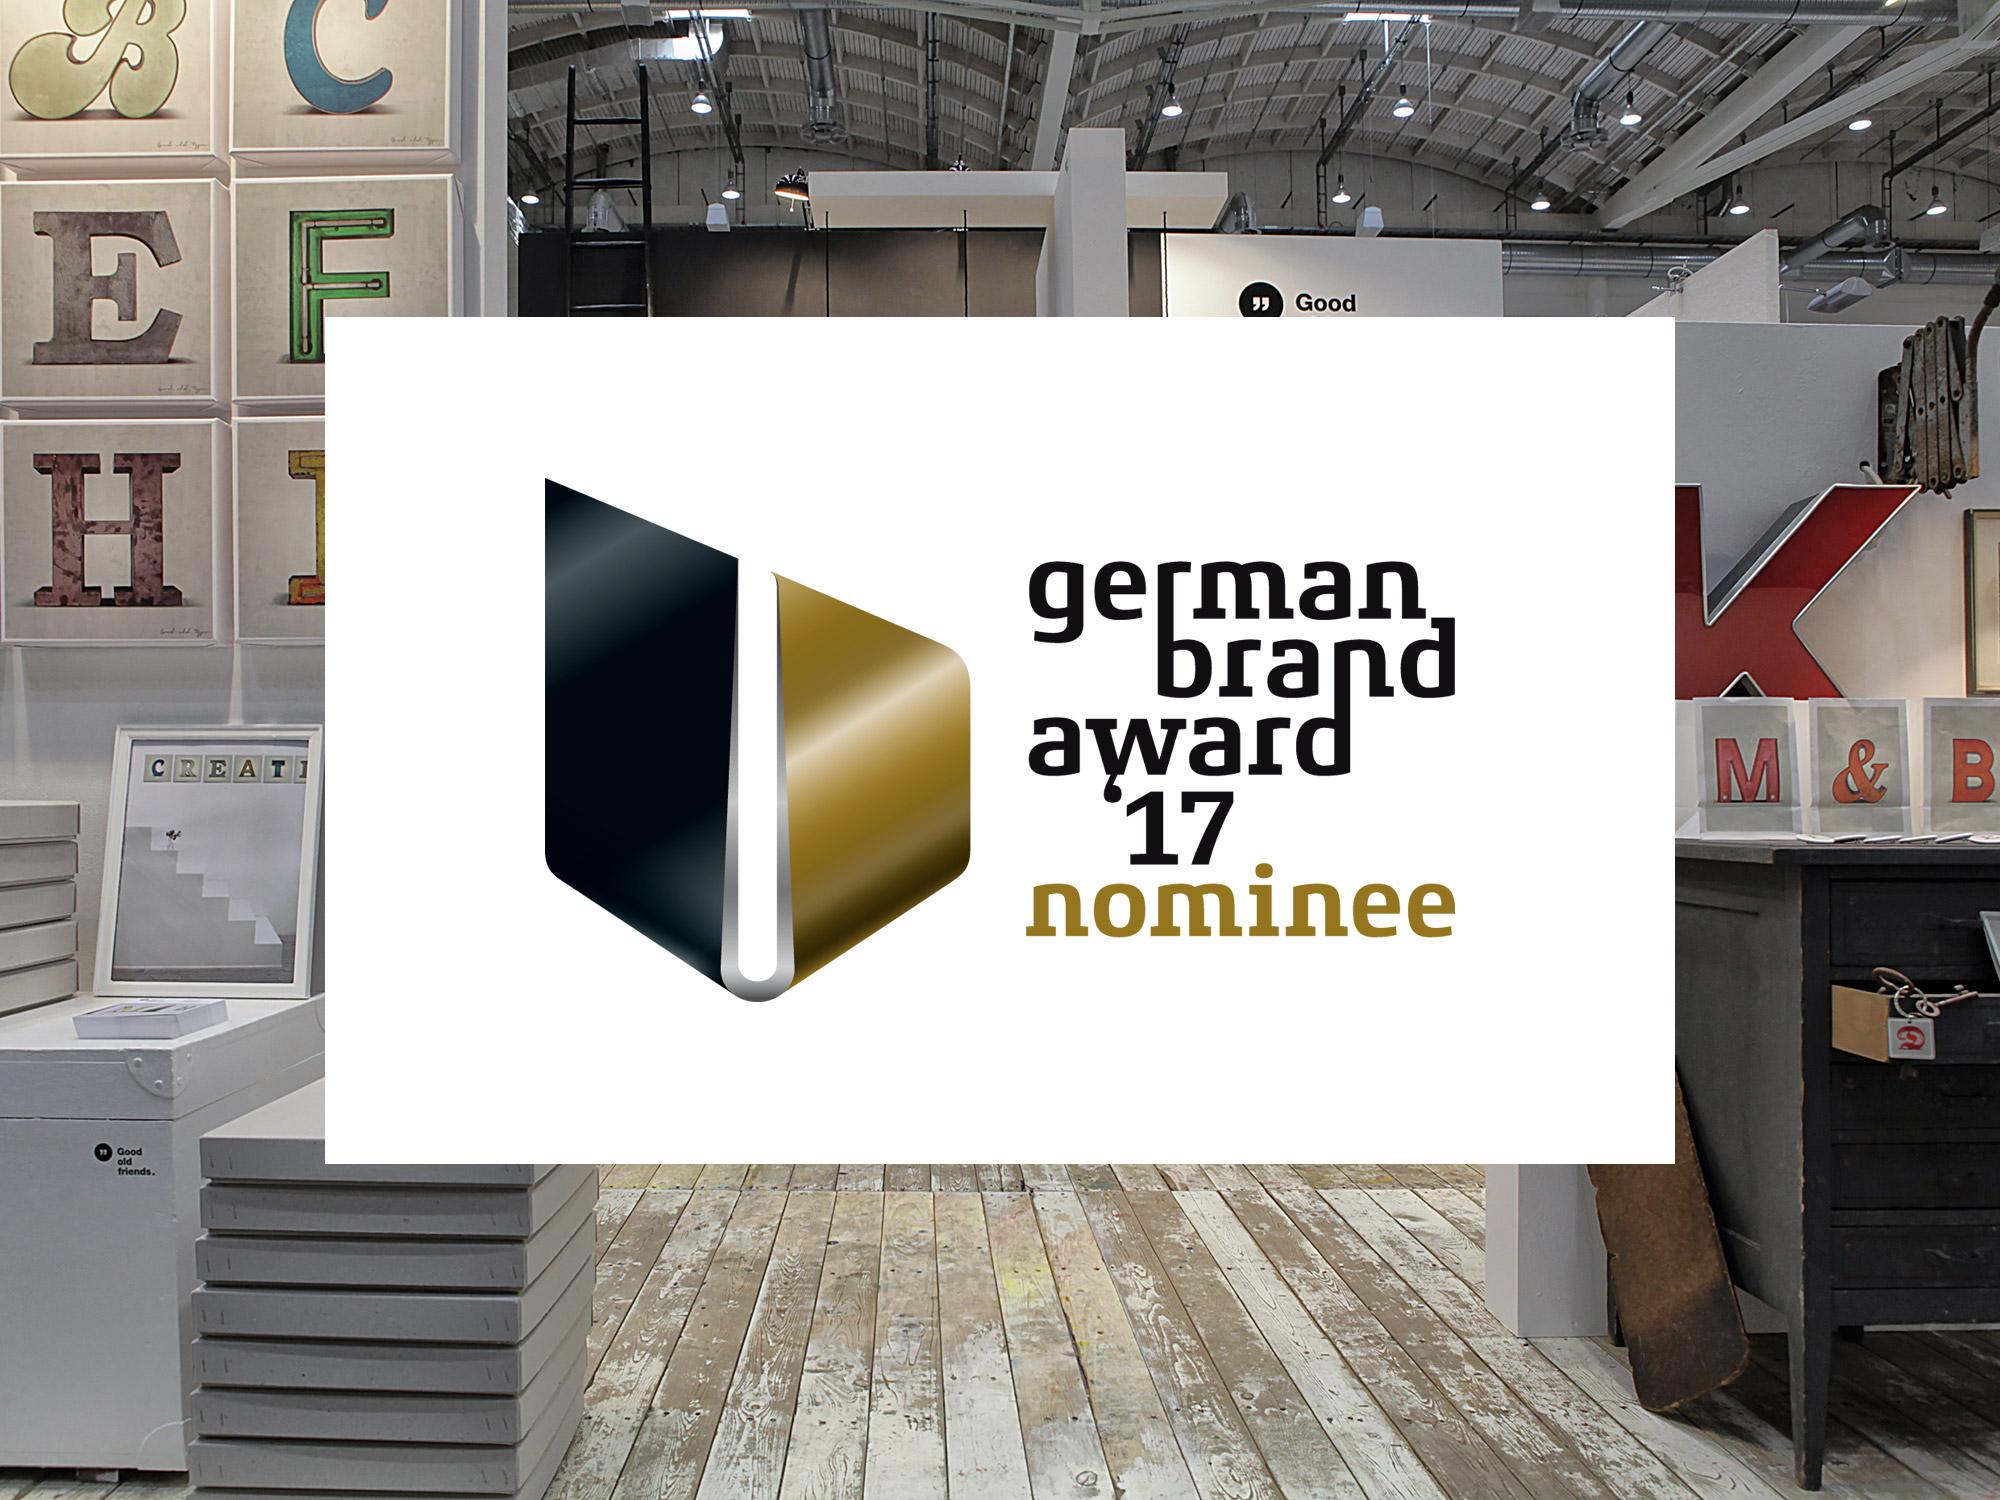 00-DSnulldrei-Dirk-Schaechter-Gof-German-Brand-Award